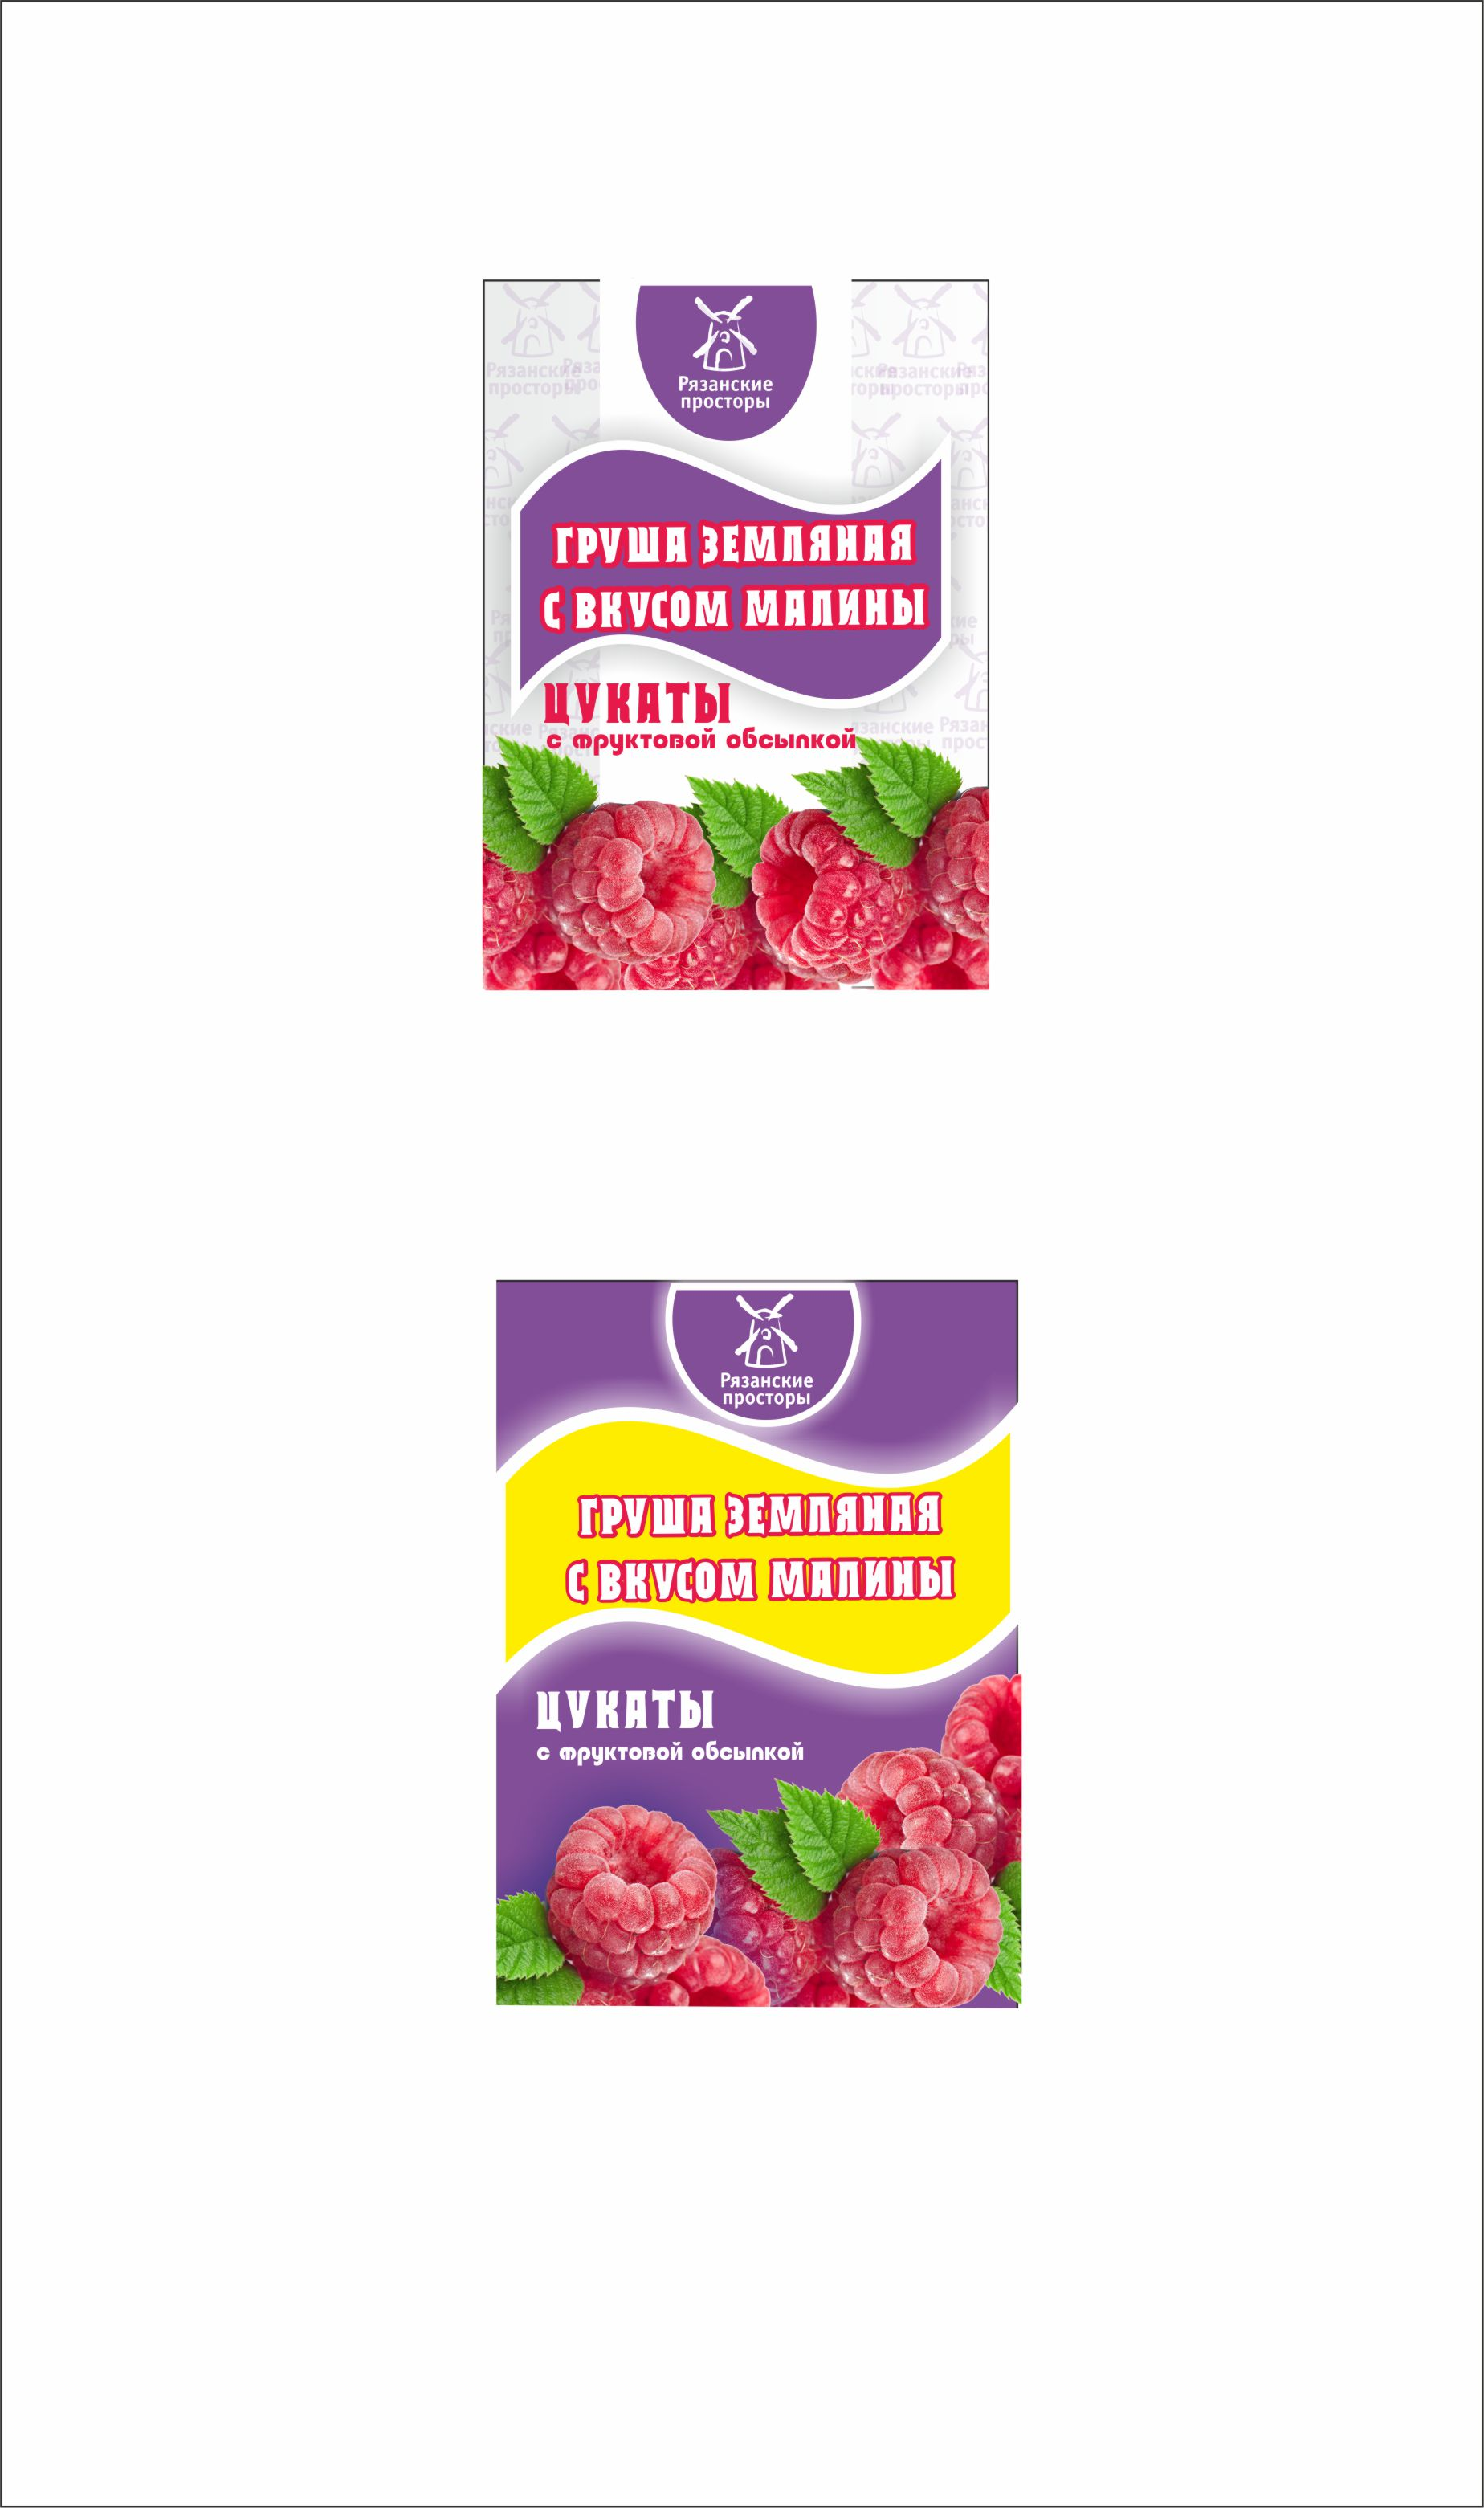 Требуется дизайн накладного картонного вкладыша на пакет.  фото f_77752b1ad0f88b82.jpg